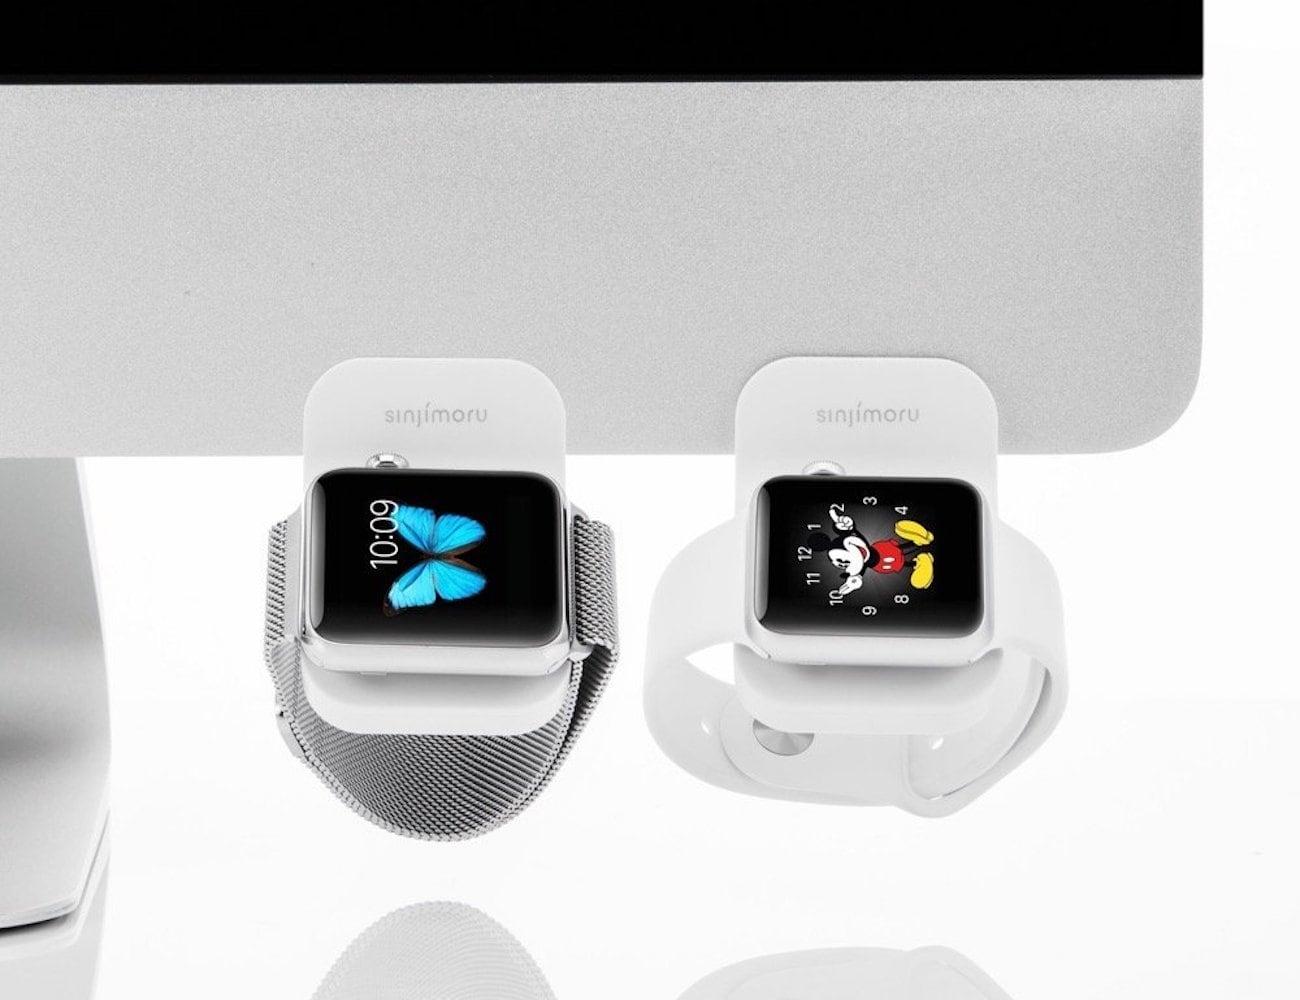 Sinjimoru Clingy 2 Apple Watch Mount